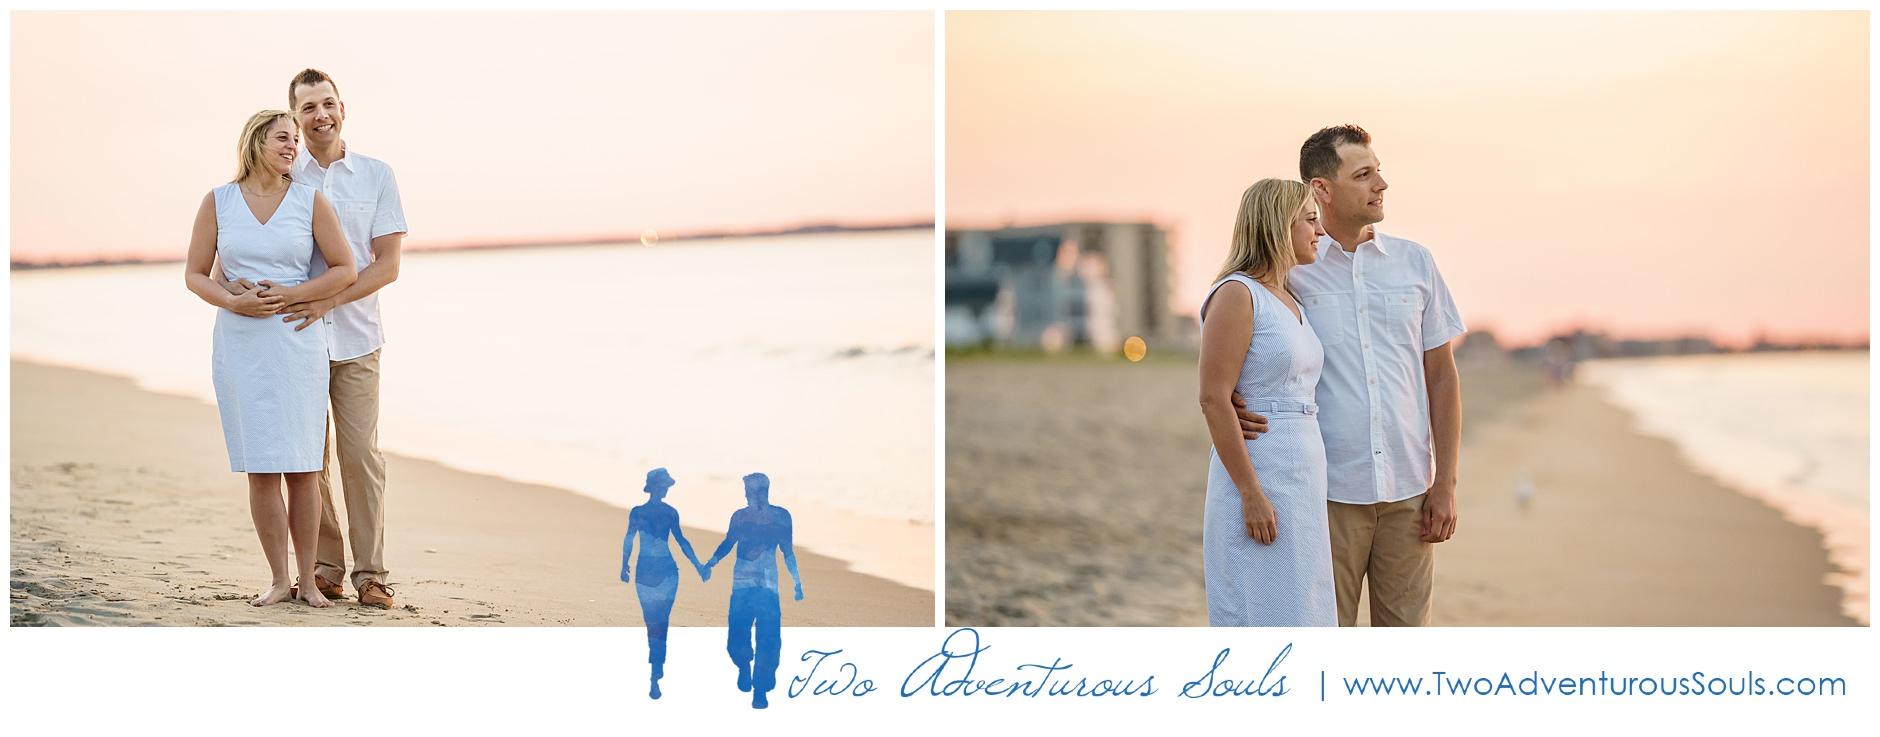 Maine Wedding Photographers, Connecticut Wedding Photographers, Old Orchard Beach Wedding Photographers, Two Adventurous Souls-JustinElise_0003.jpg